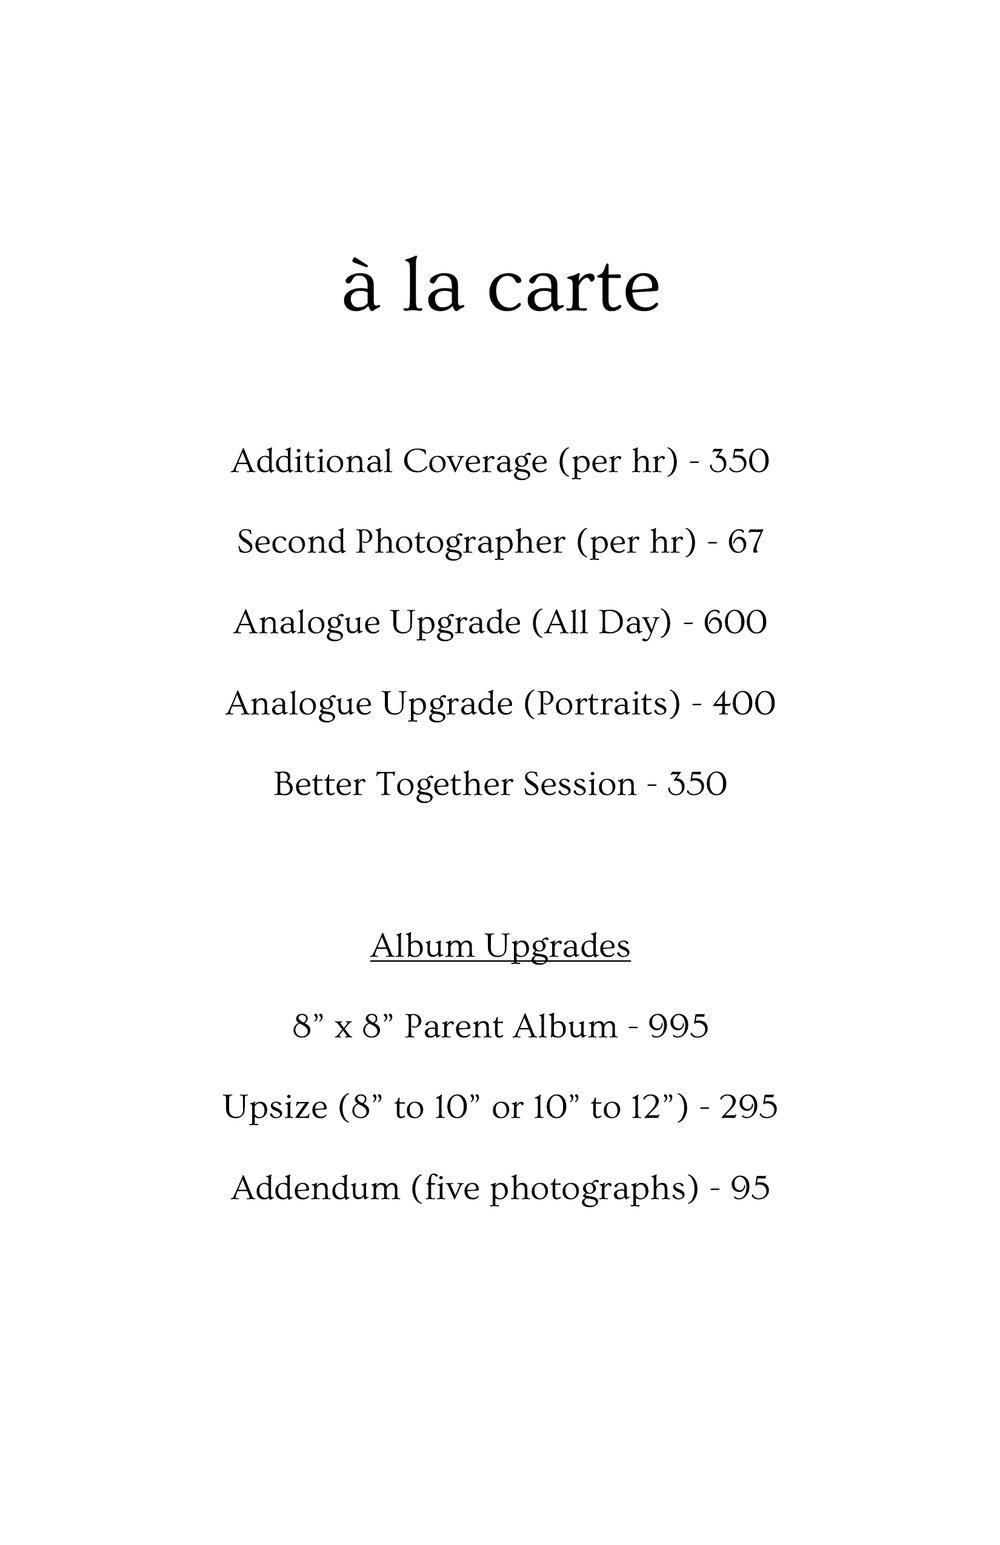 2017 Wedding Pricing Cards - 04alacarte.jpg